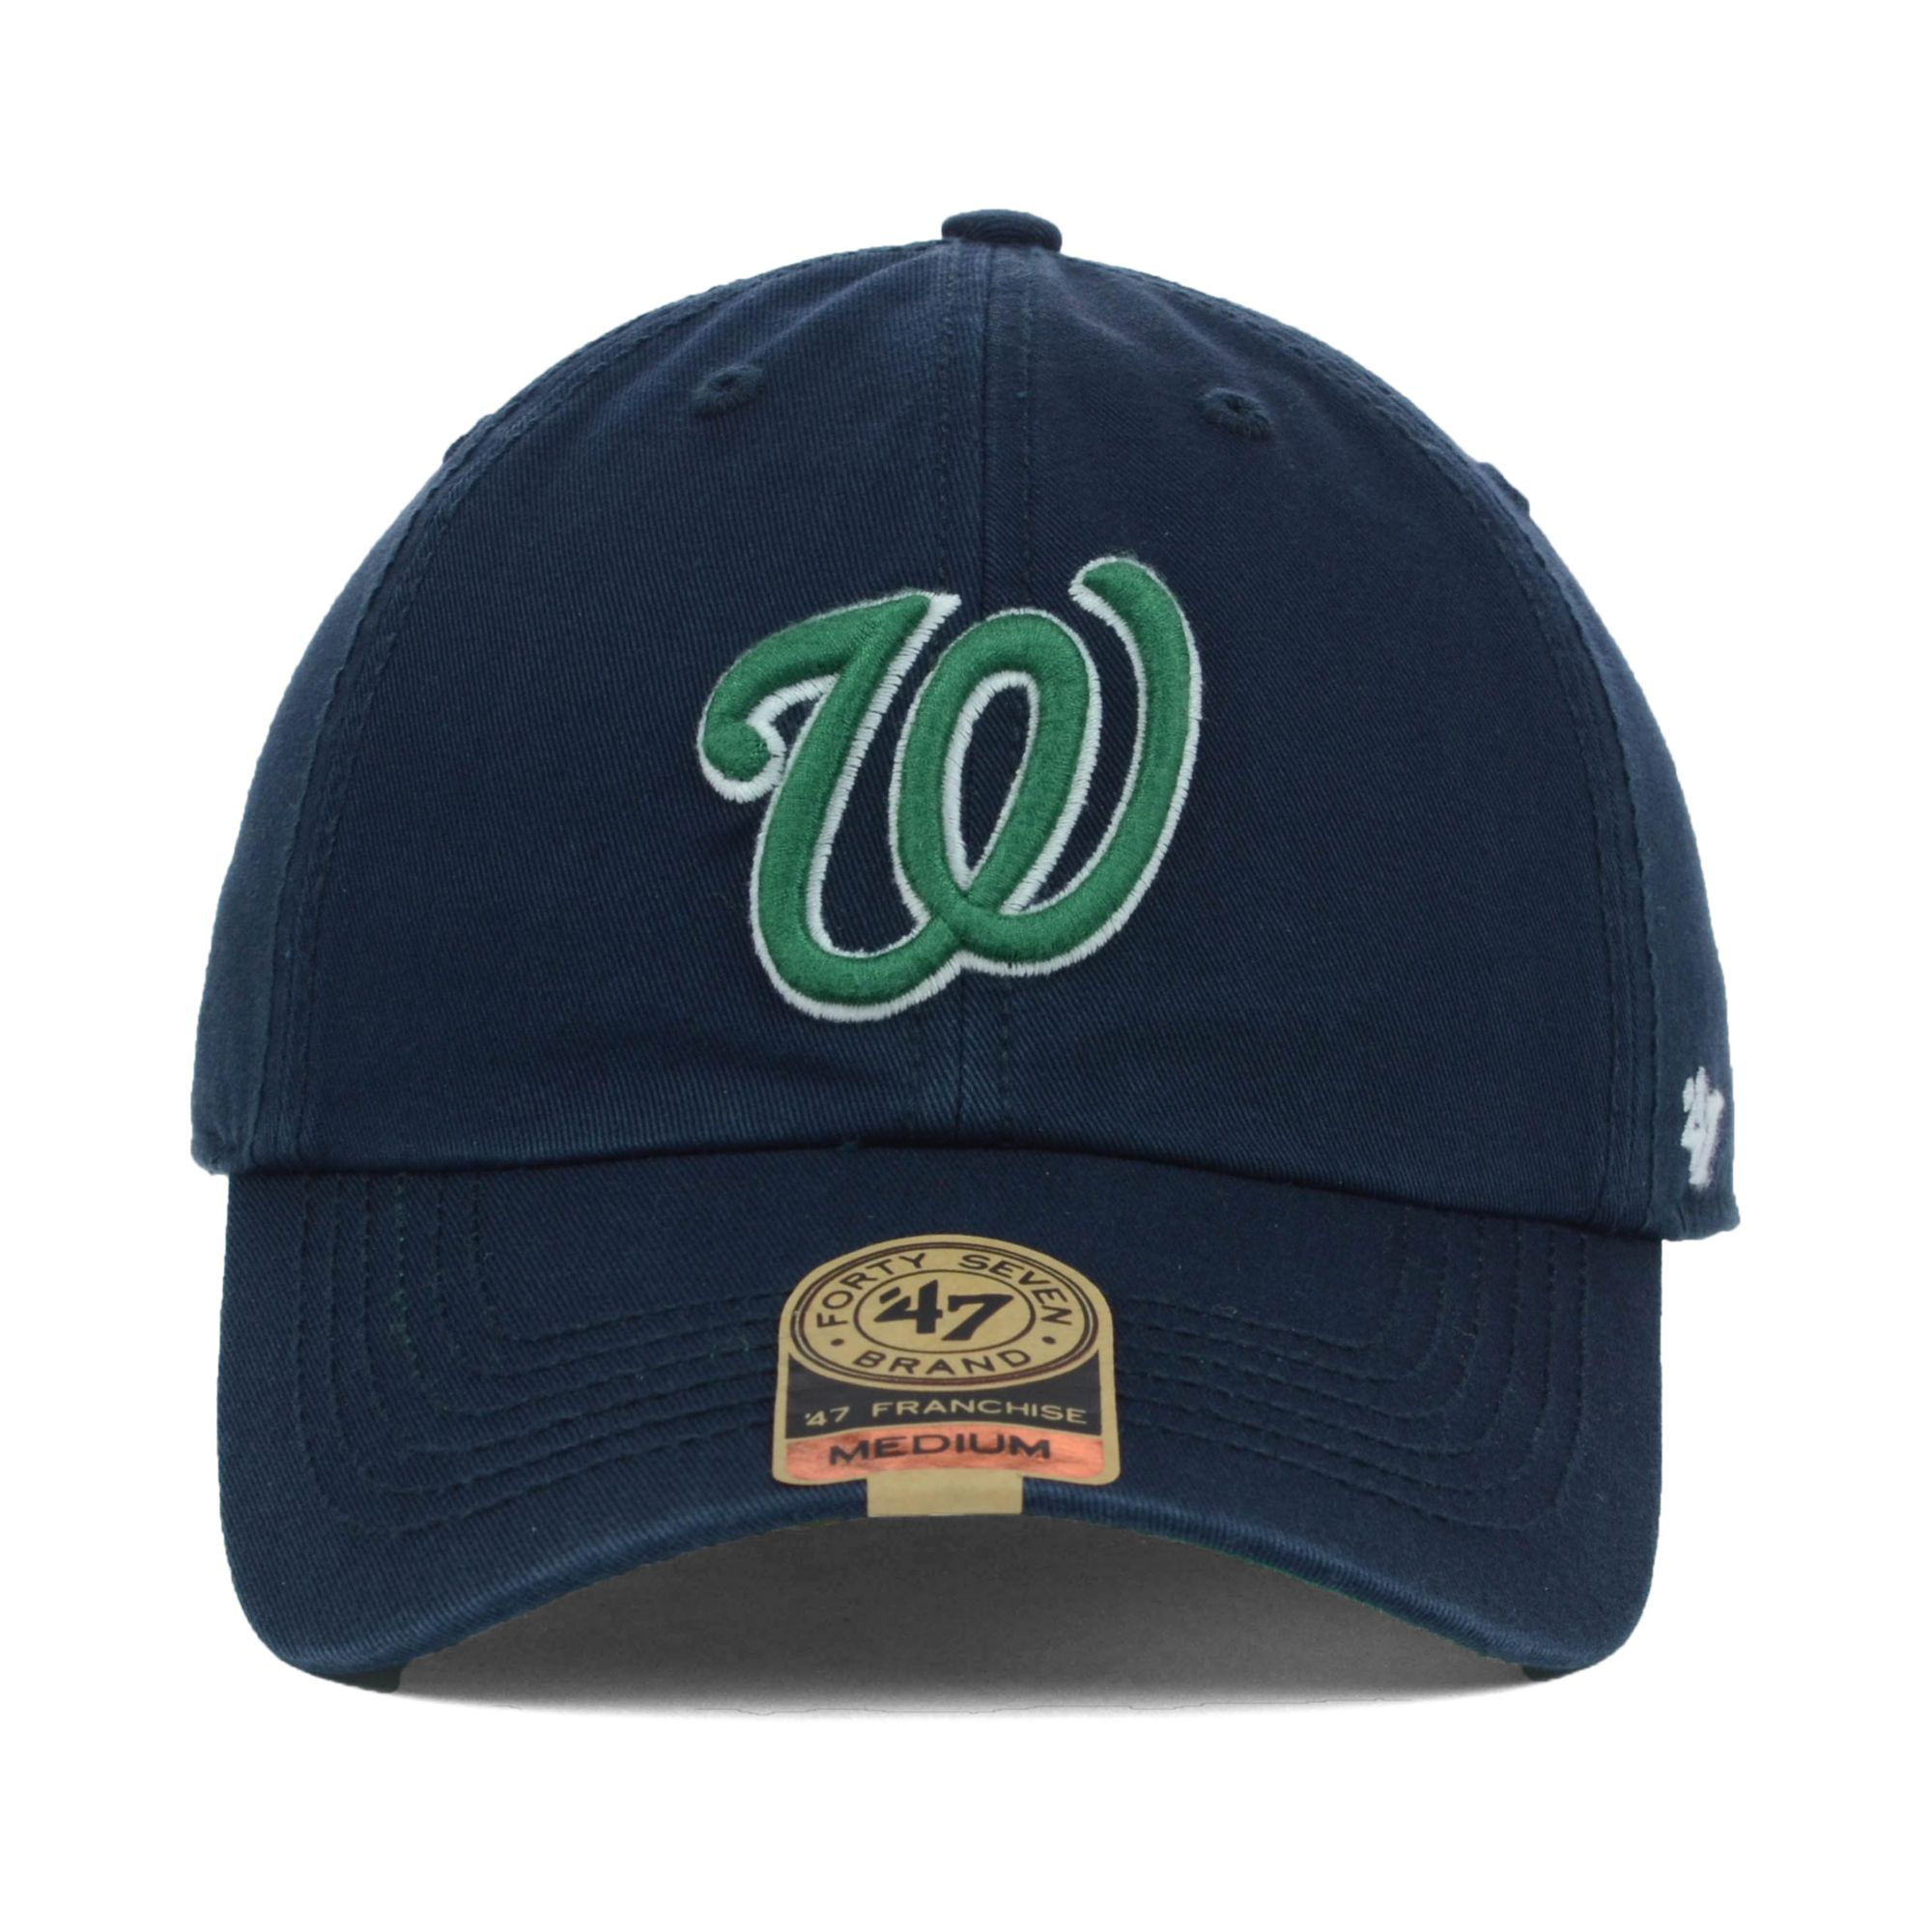 cffa2659a6650 ... authentic lyst 47 brand washington nationals mlb dublin cap in blue for  men cb982 4f00a